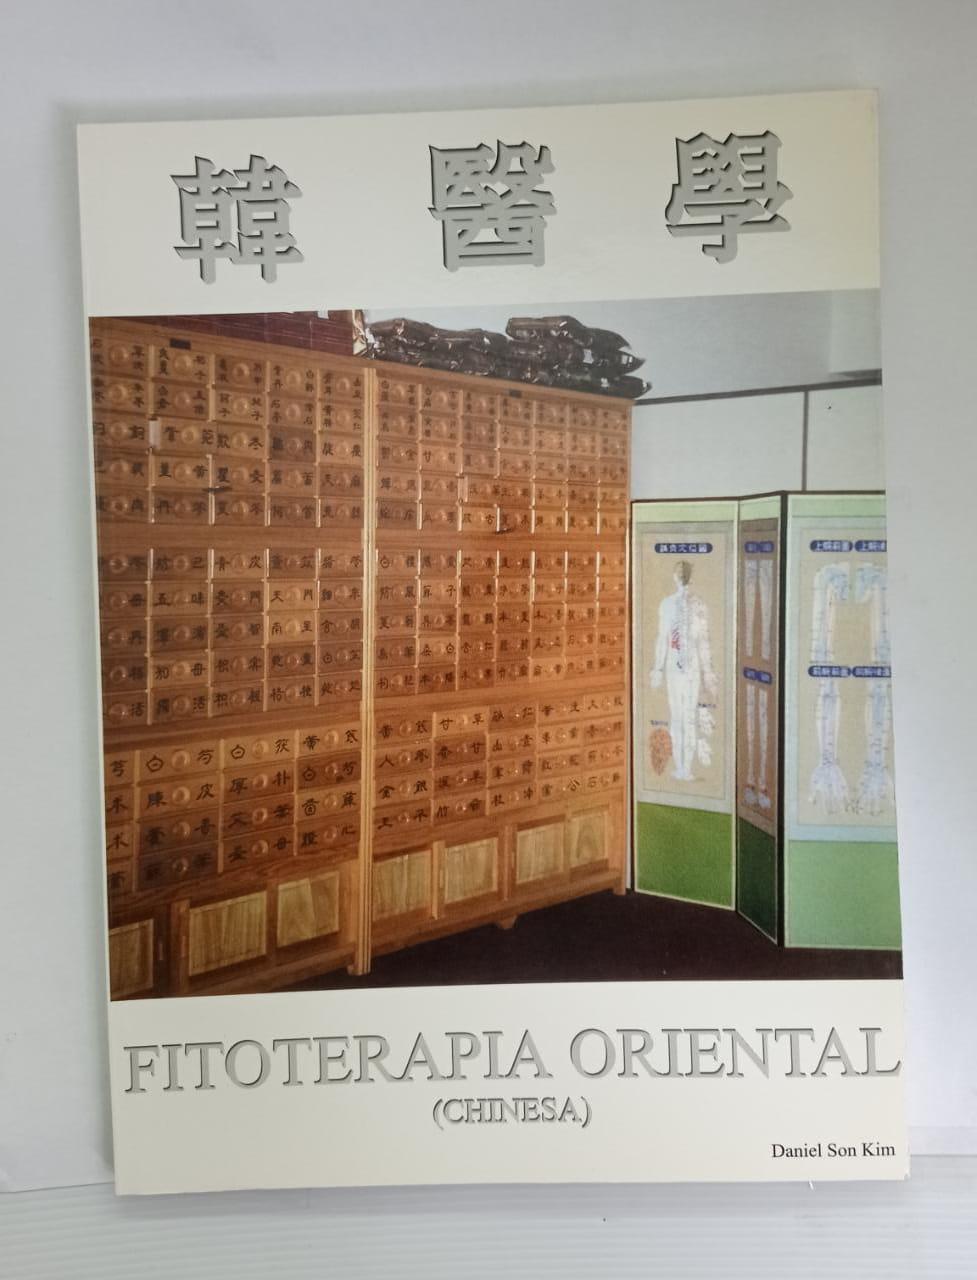 Fitoterapia Oriental (Chinesa)